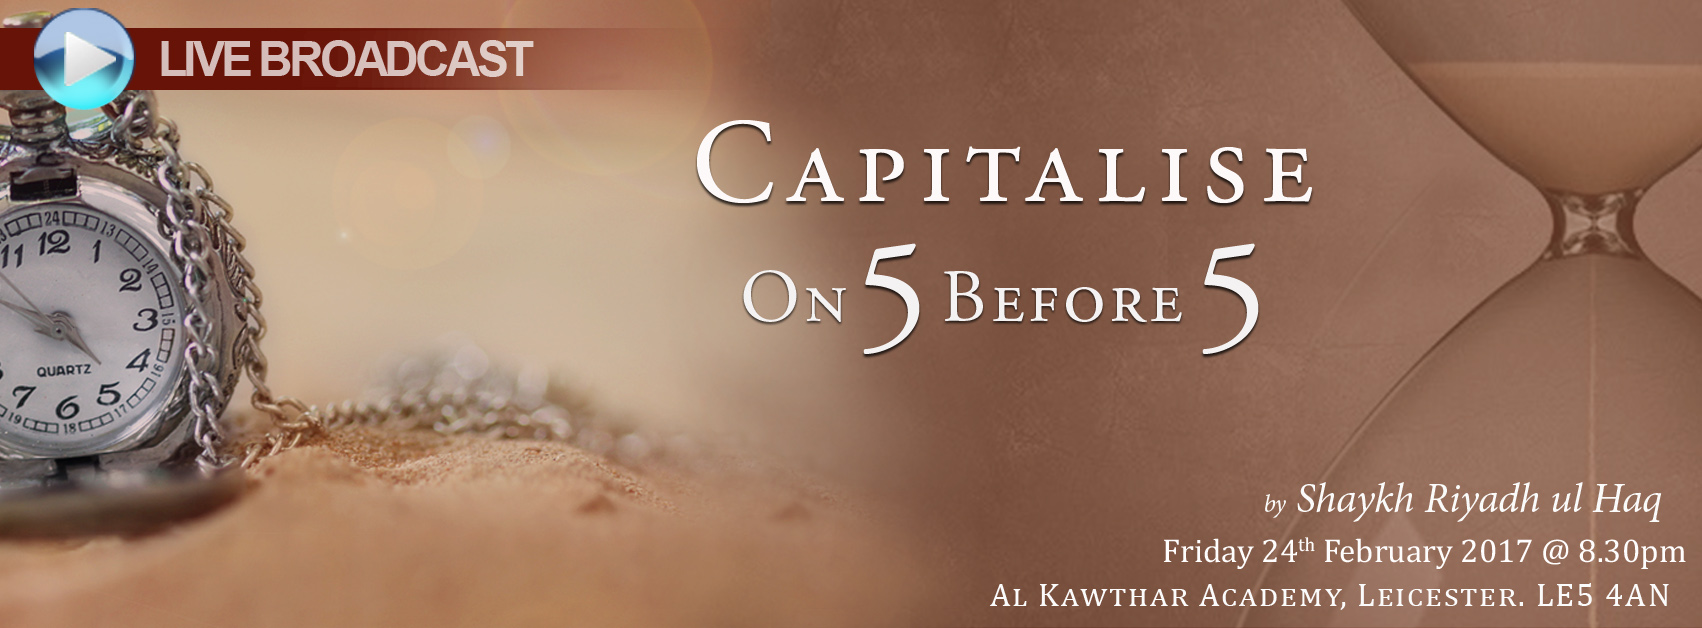 CAPITALISE ON 5 BEFORE 5